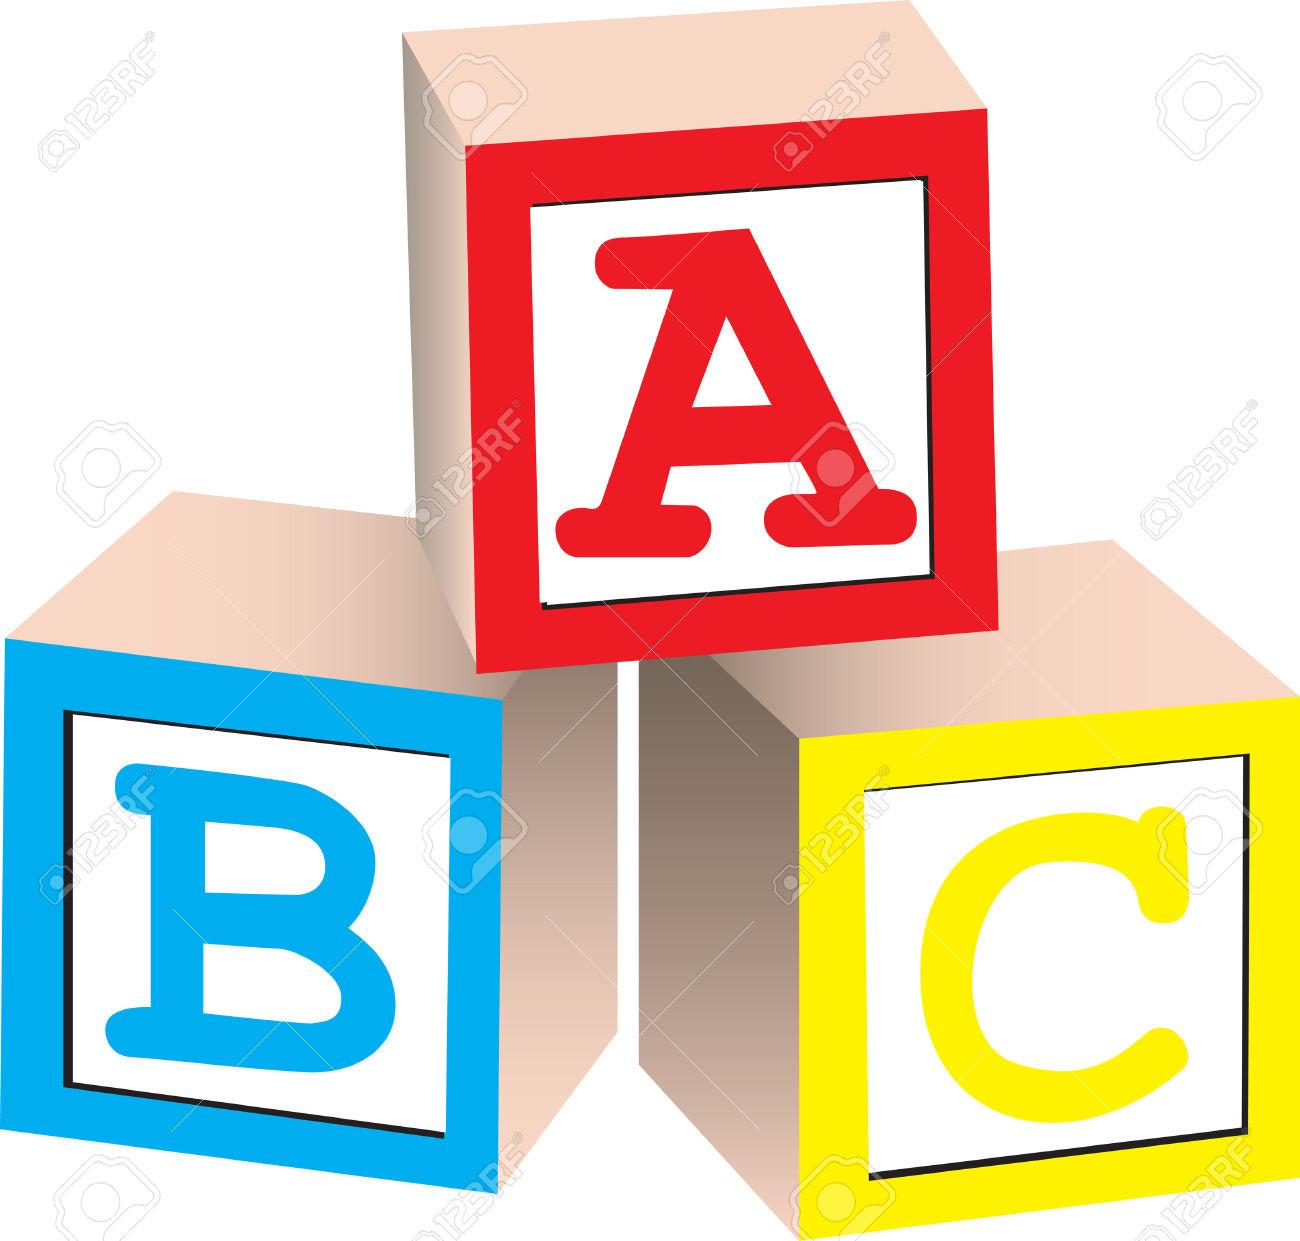 Alphabet block letter clipart.